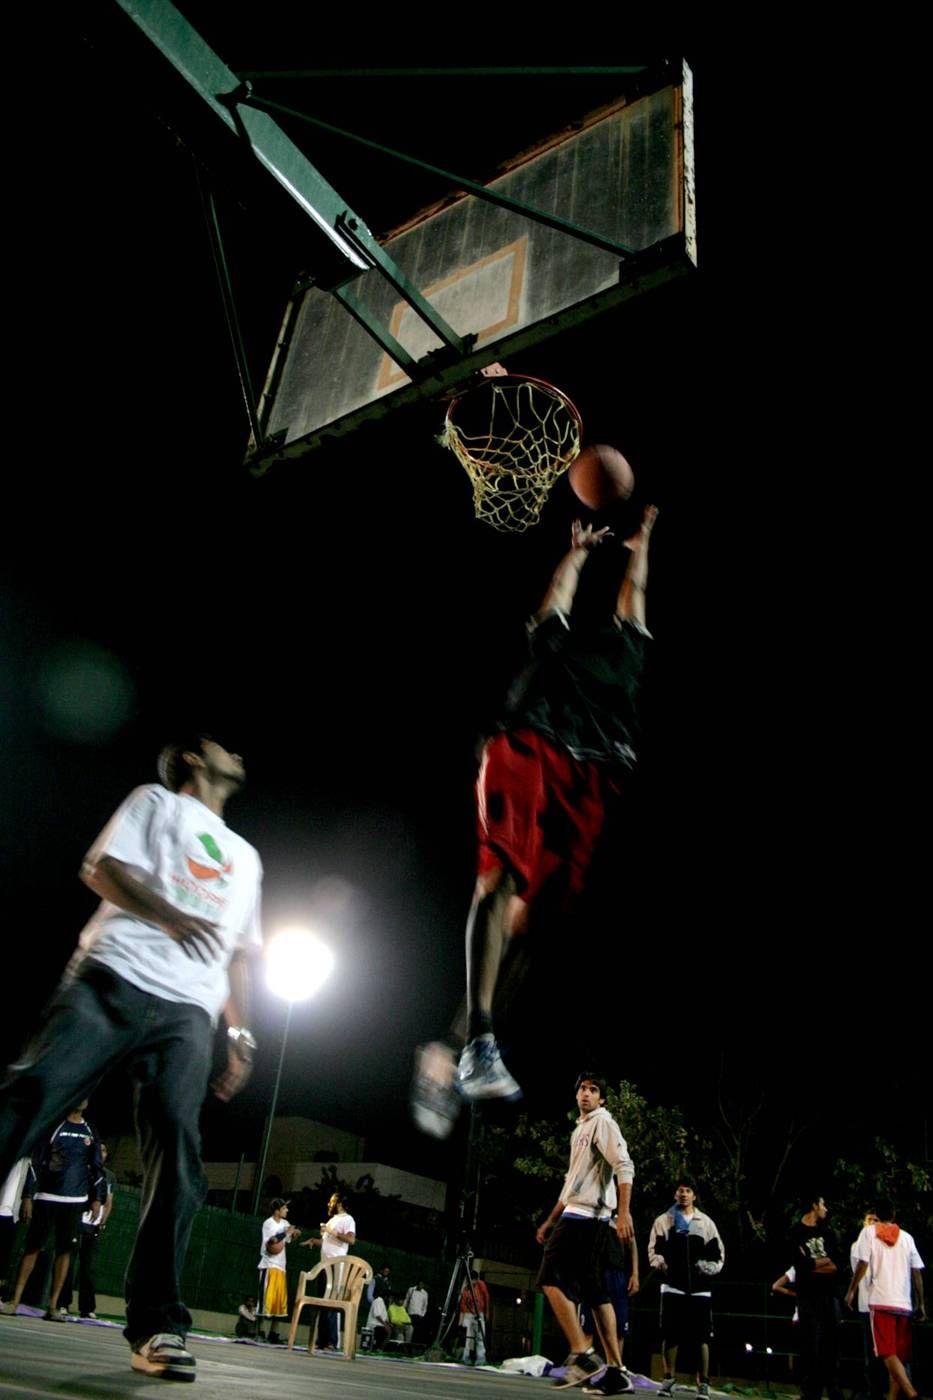 India S Got Hops Basketball India Wrestling India Basketball